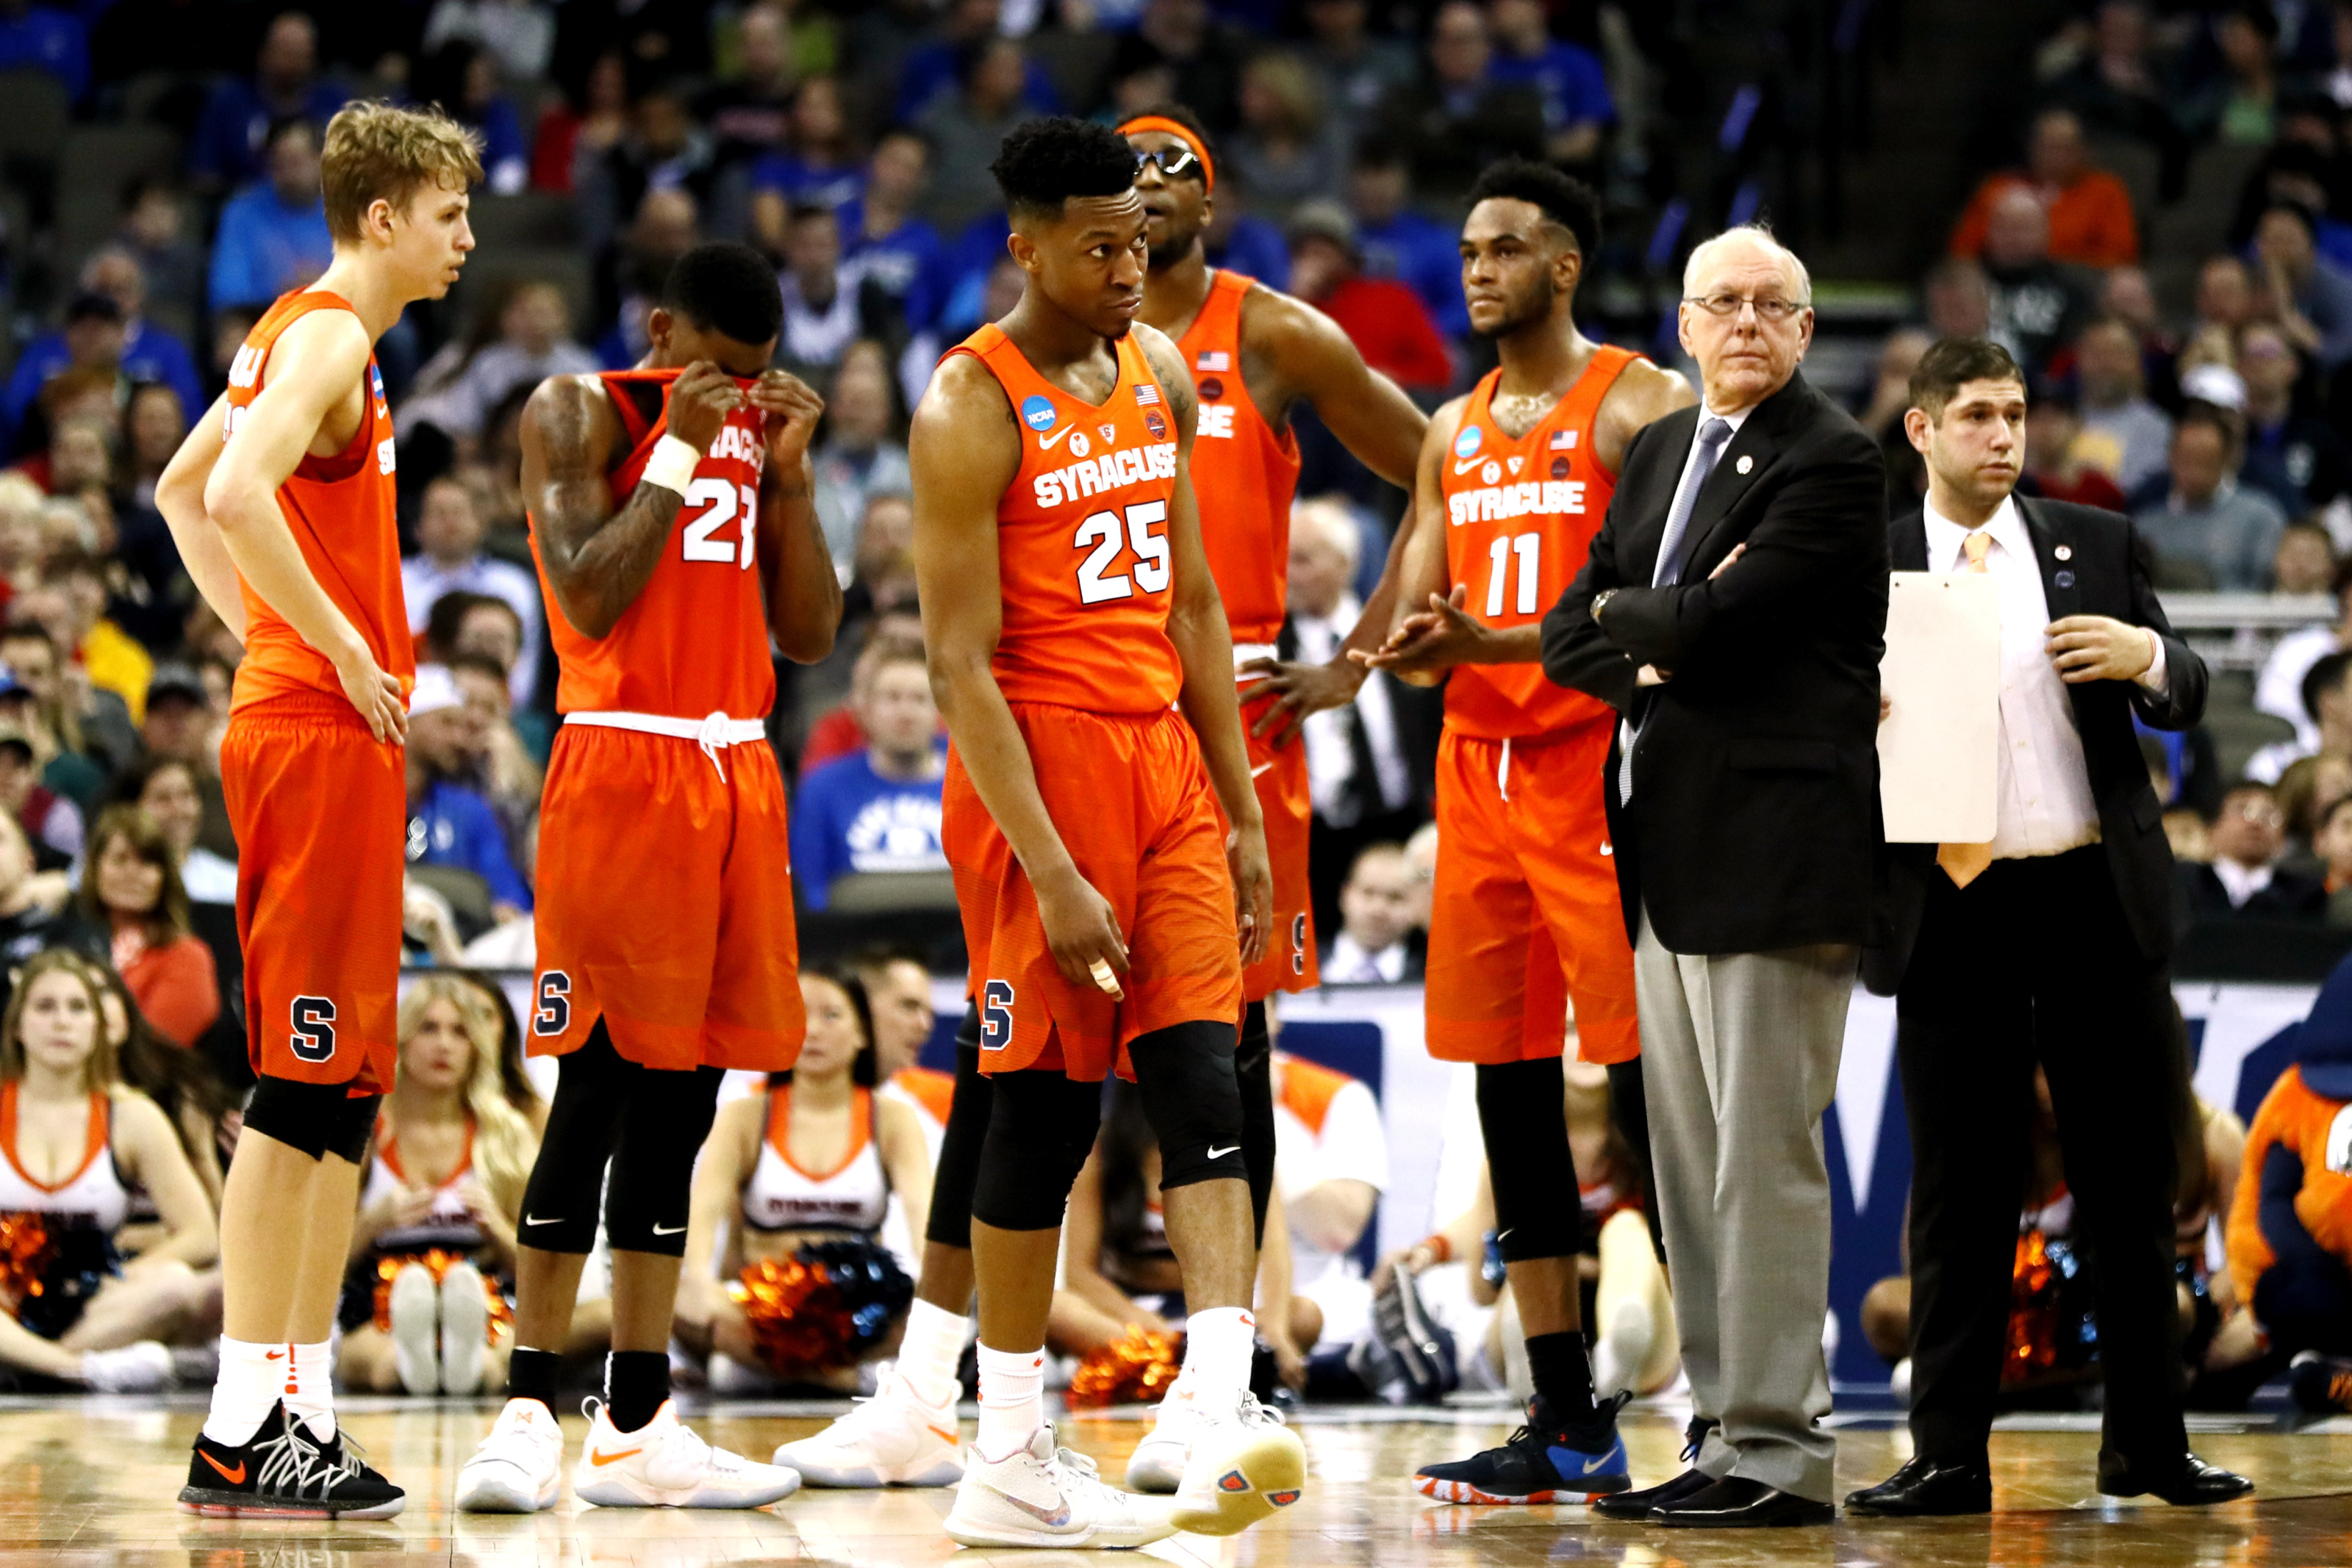 Syracuse Basketball Jim Boeheim S Comments Regarding Darius Bazley Aren T Problematic